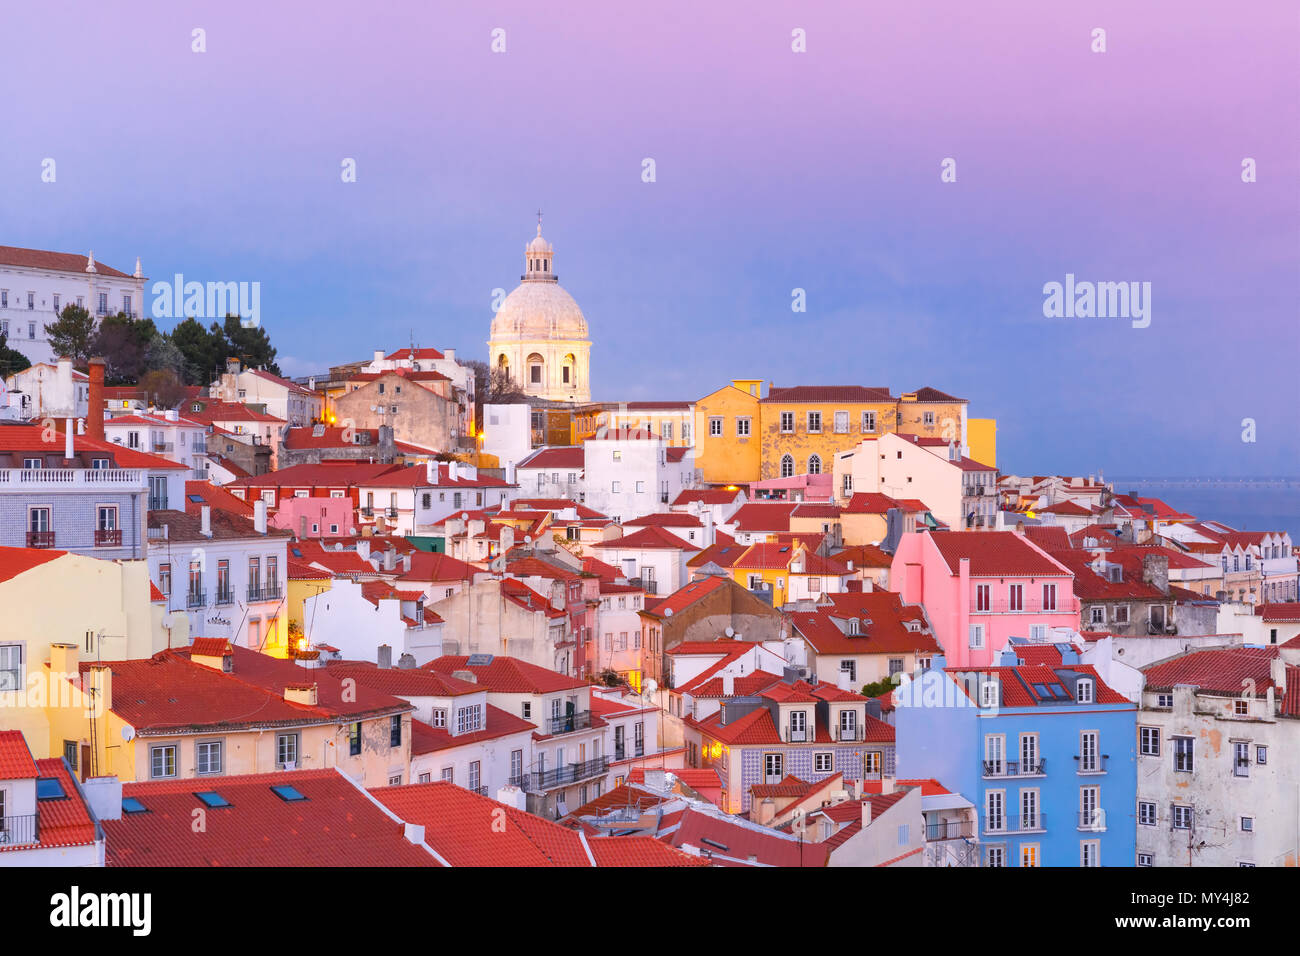 En la noche de Alfama, Lisboa, Portugal Imagen De Stock